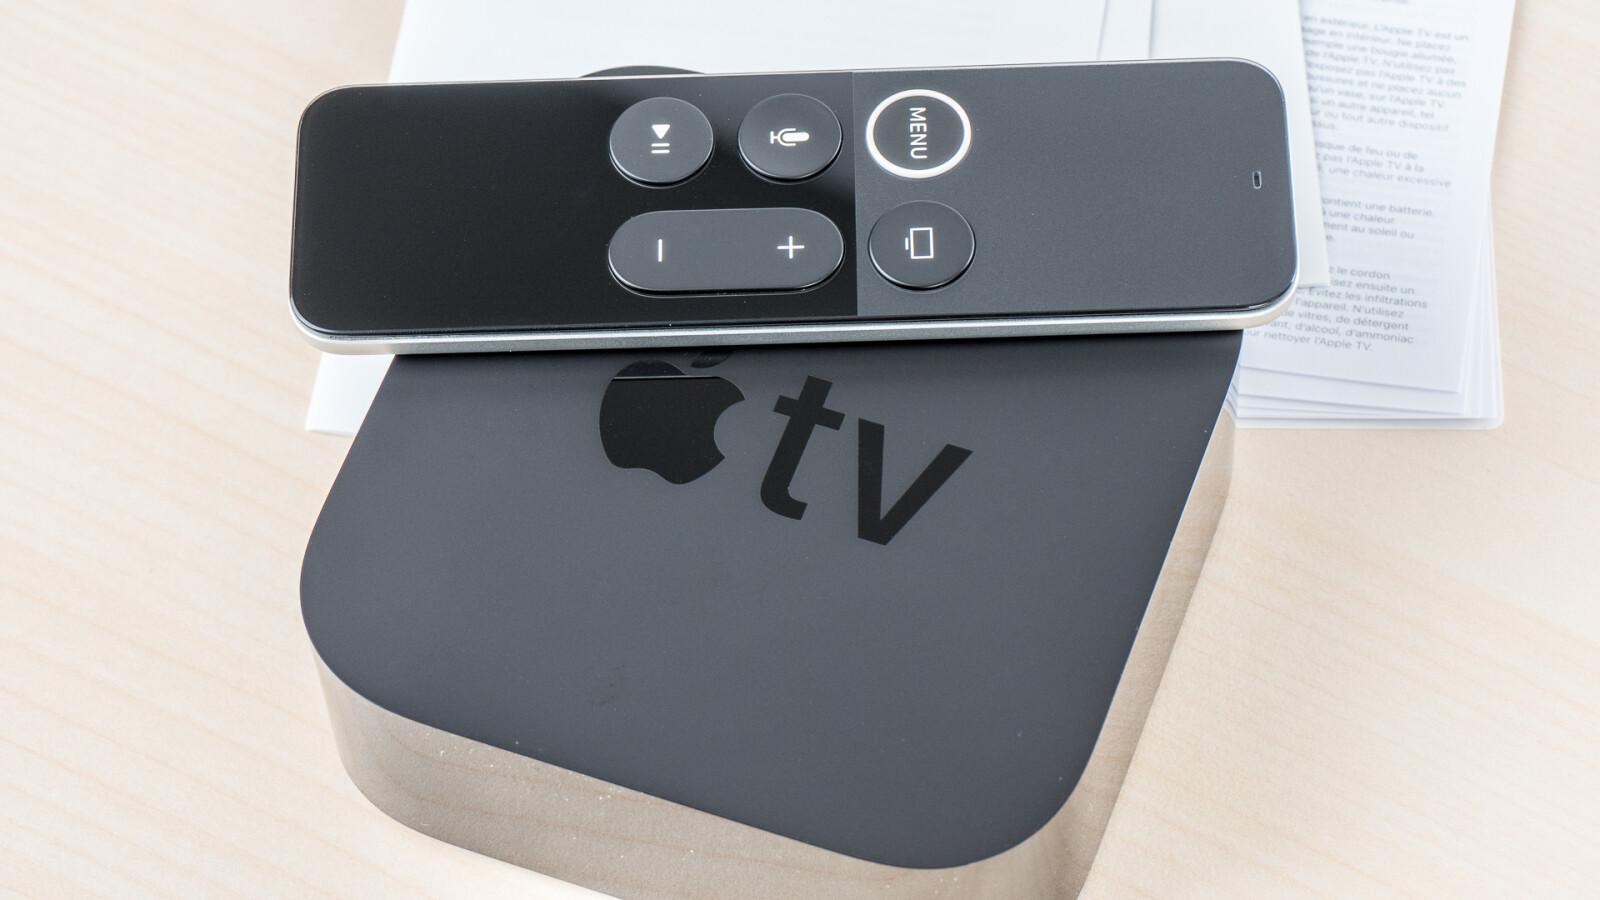 Apple Tv 4k Die Besten Apps Fur Euren Mediaplayer Netzwelt